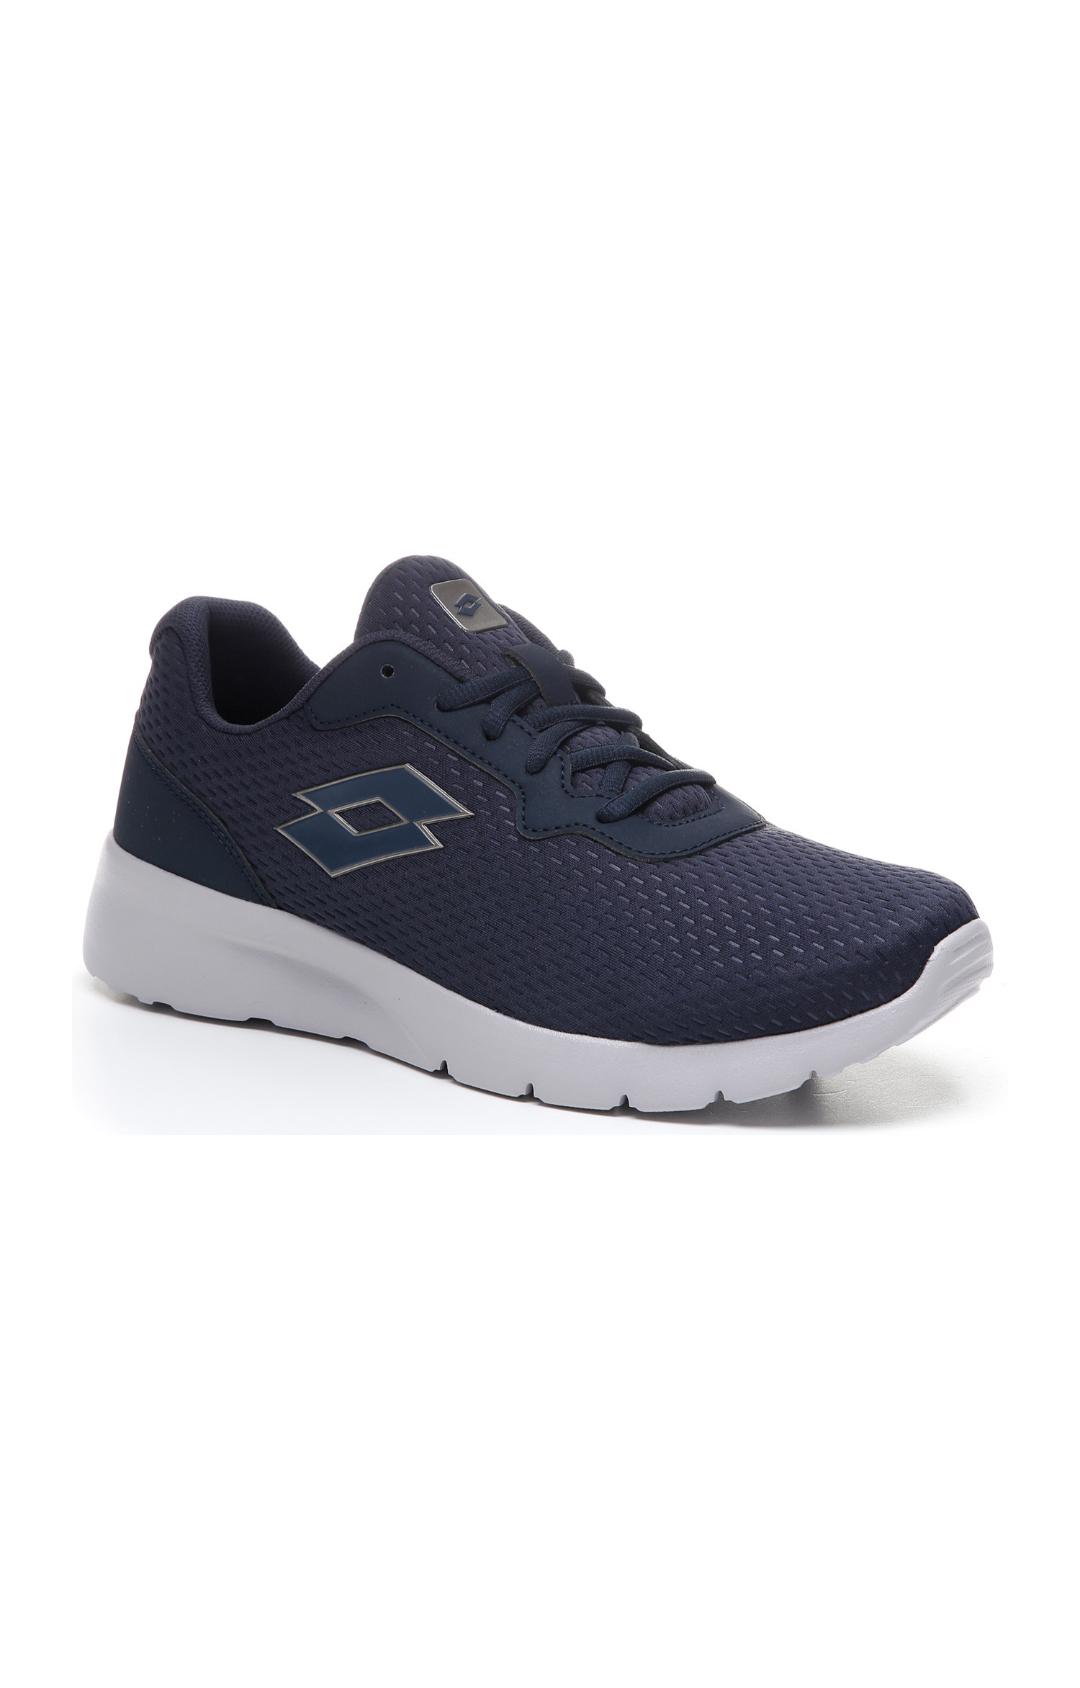 Lotto | Lotto Men's Megalight Iv Dark Blue/Gravity Titan Training Shoes